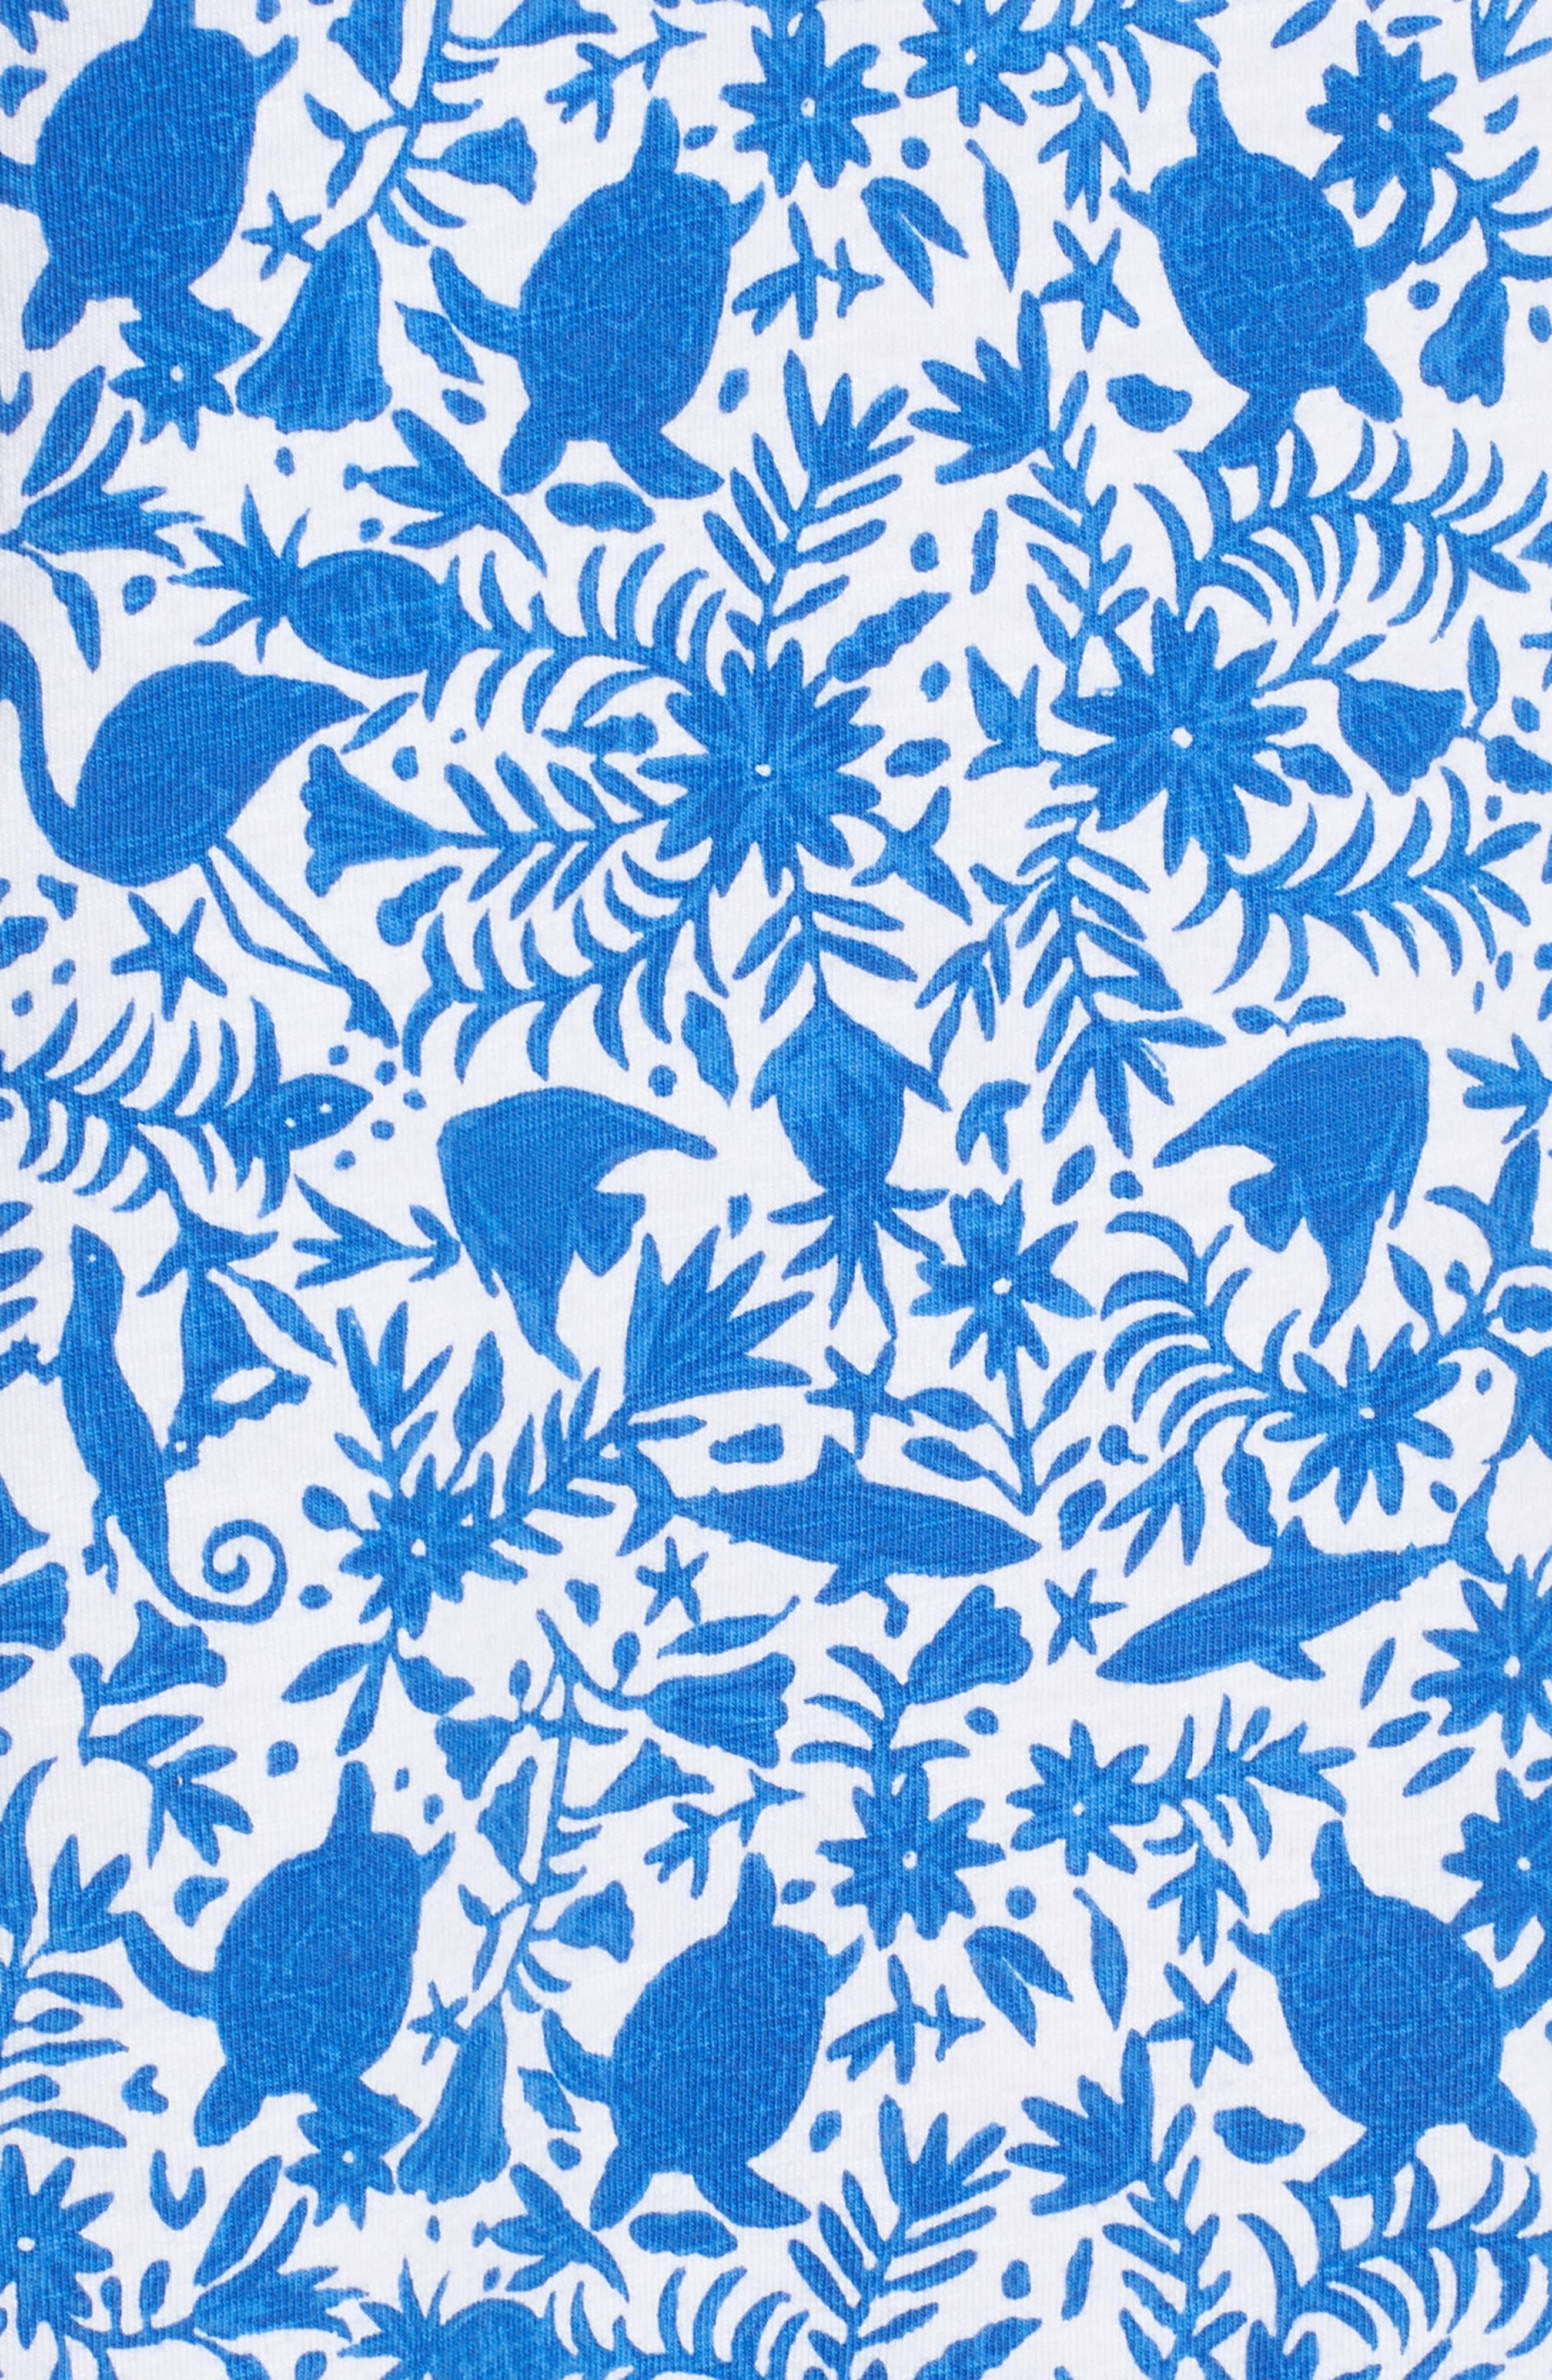 Bahamas Otomi Print Stretch Cotton Dress,                             Alternate thumbnail 5, color,                             Yacht Blue